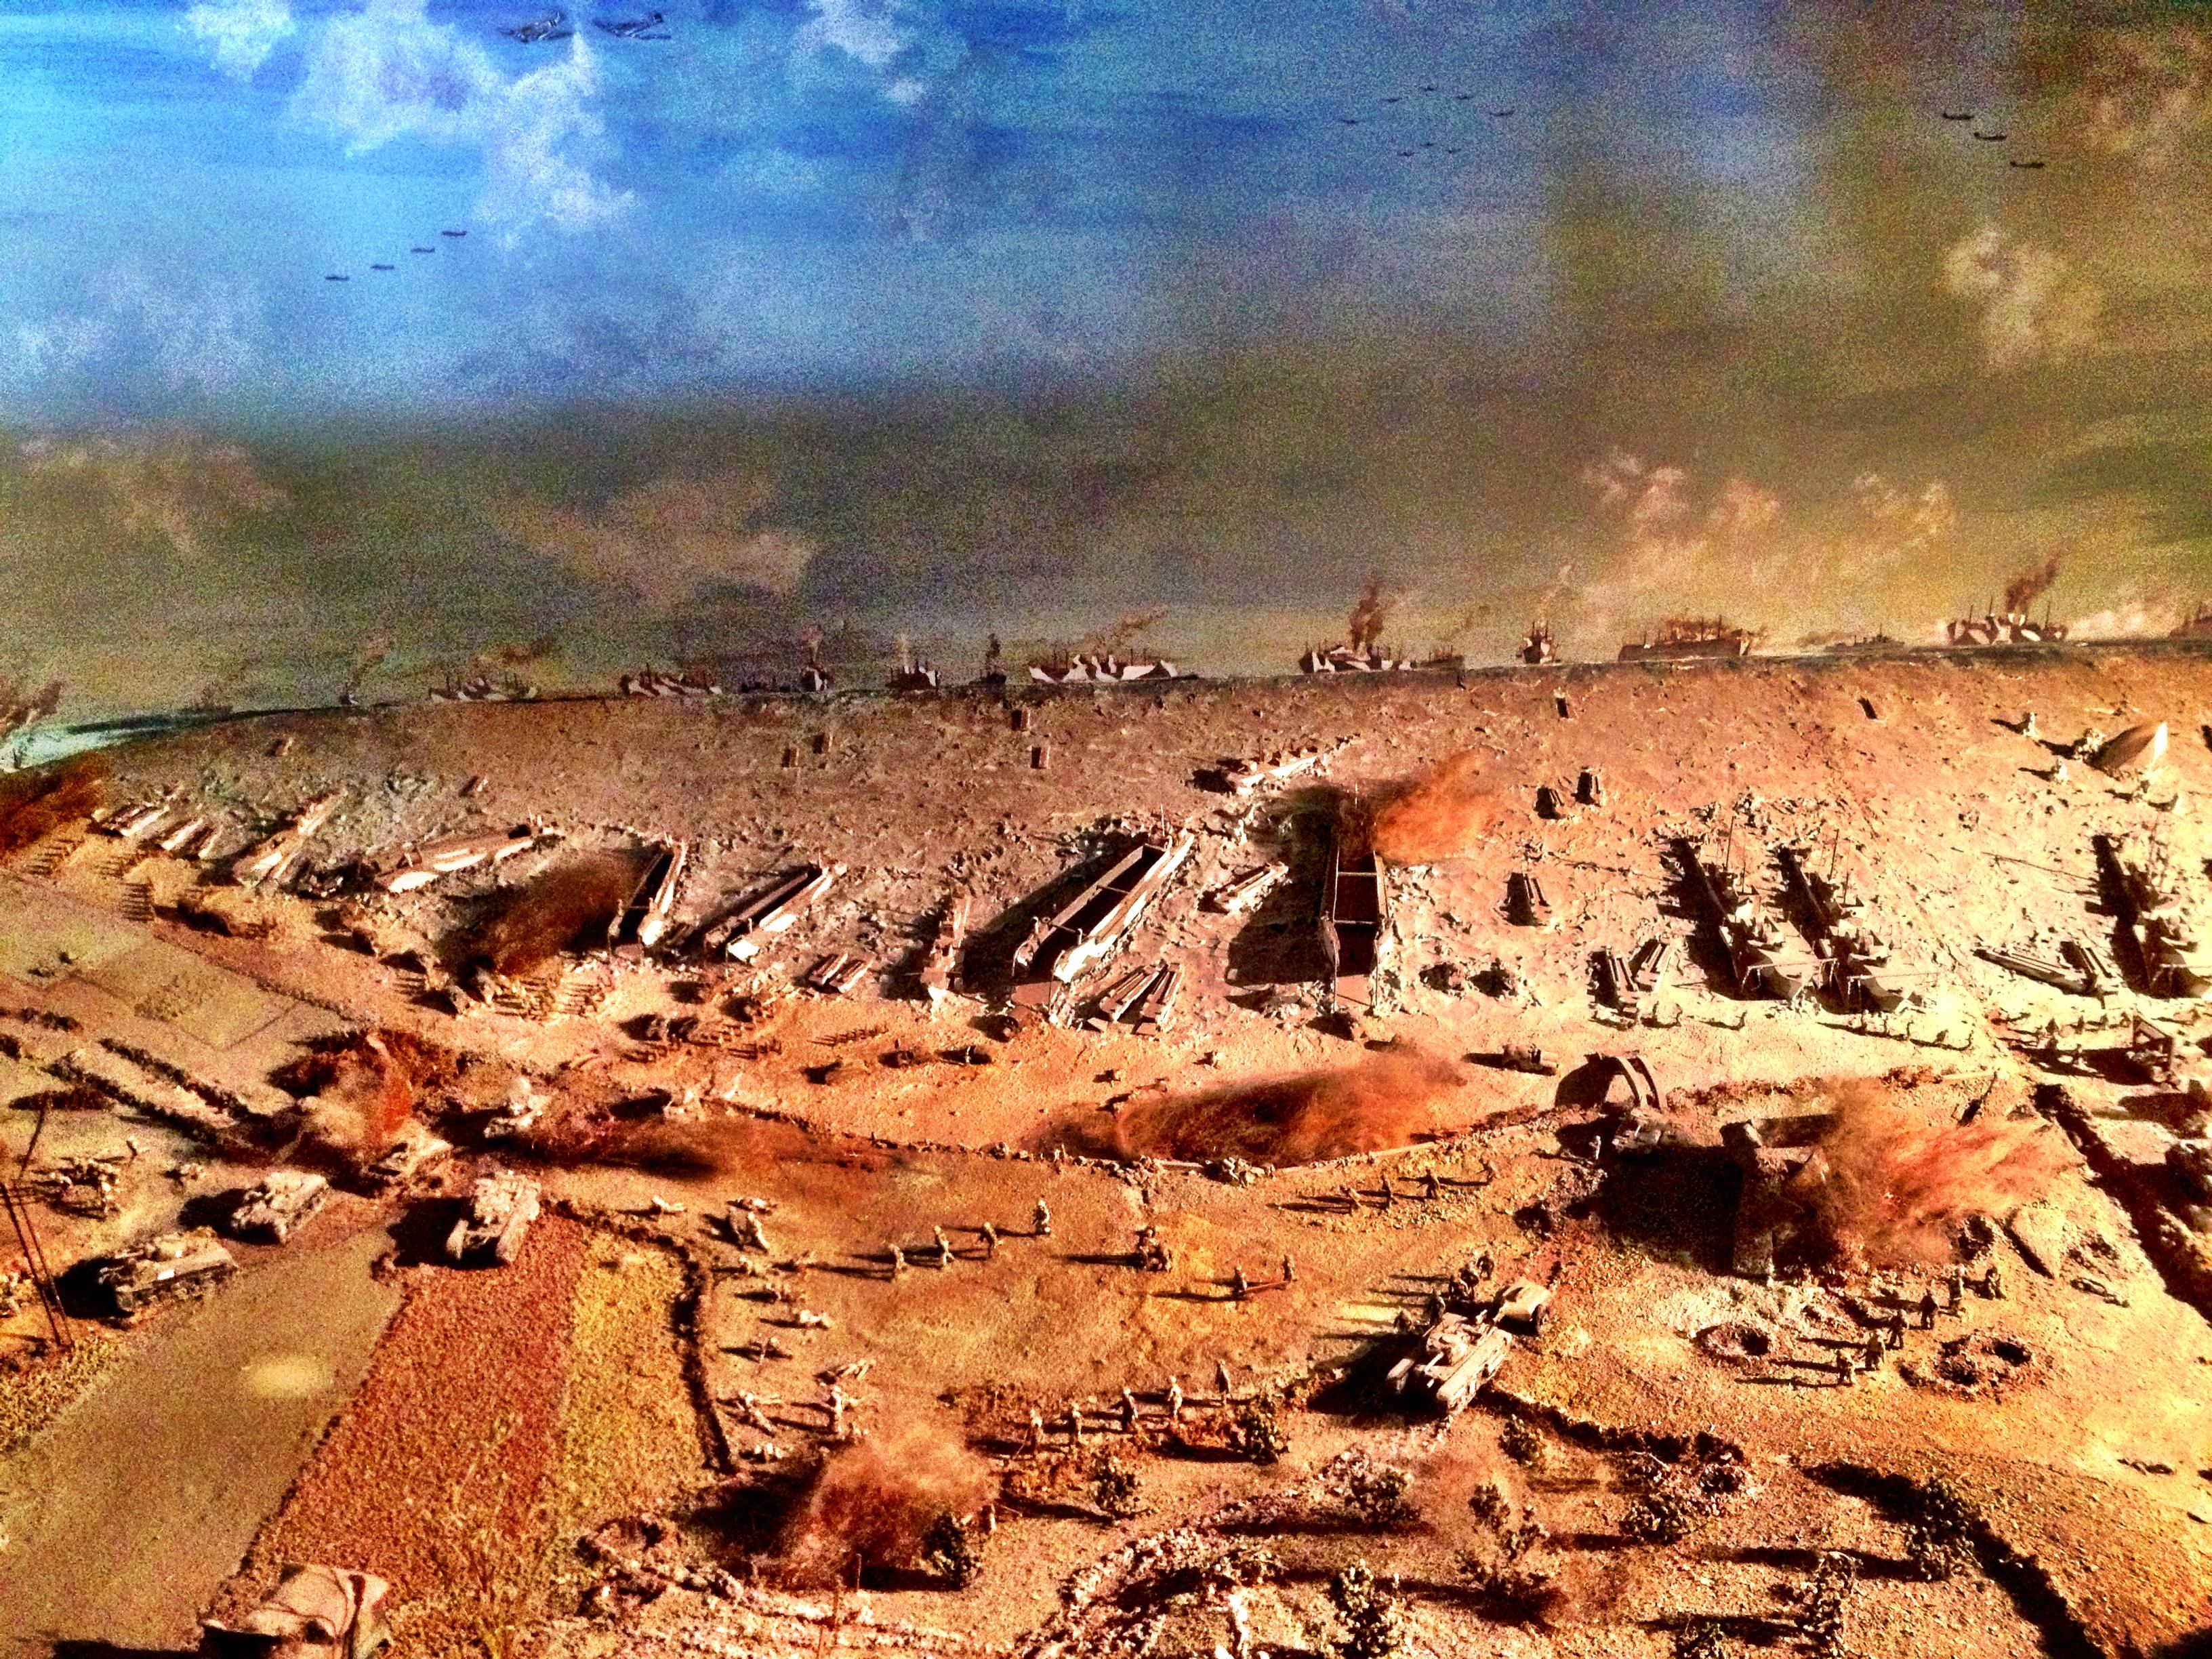 normandia 2014 sbarco salerno - photo#30